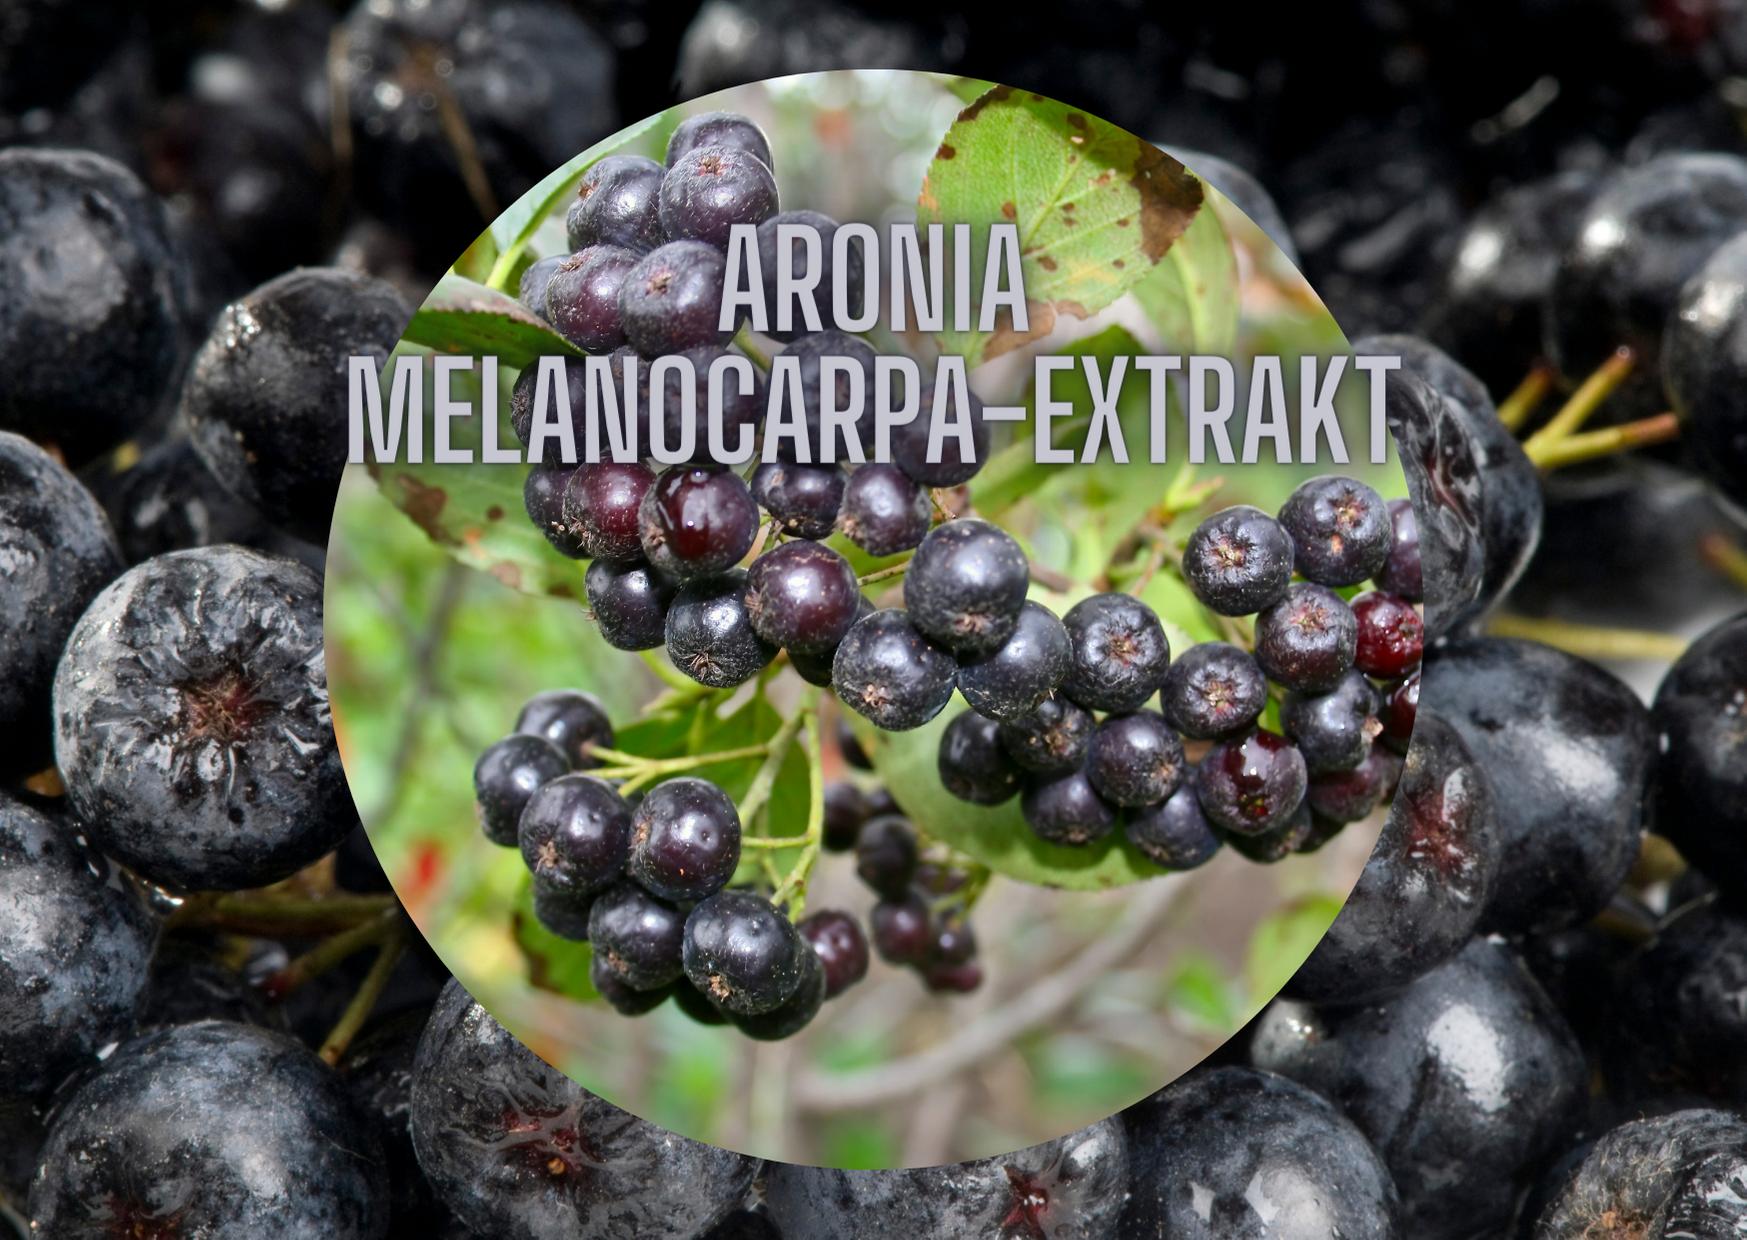 ARONIA-EXTRAKT